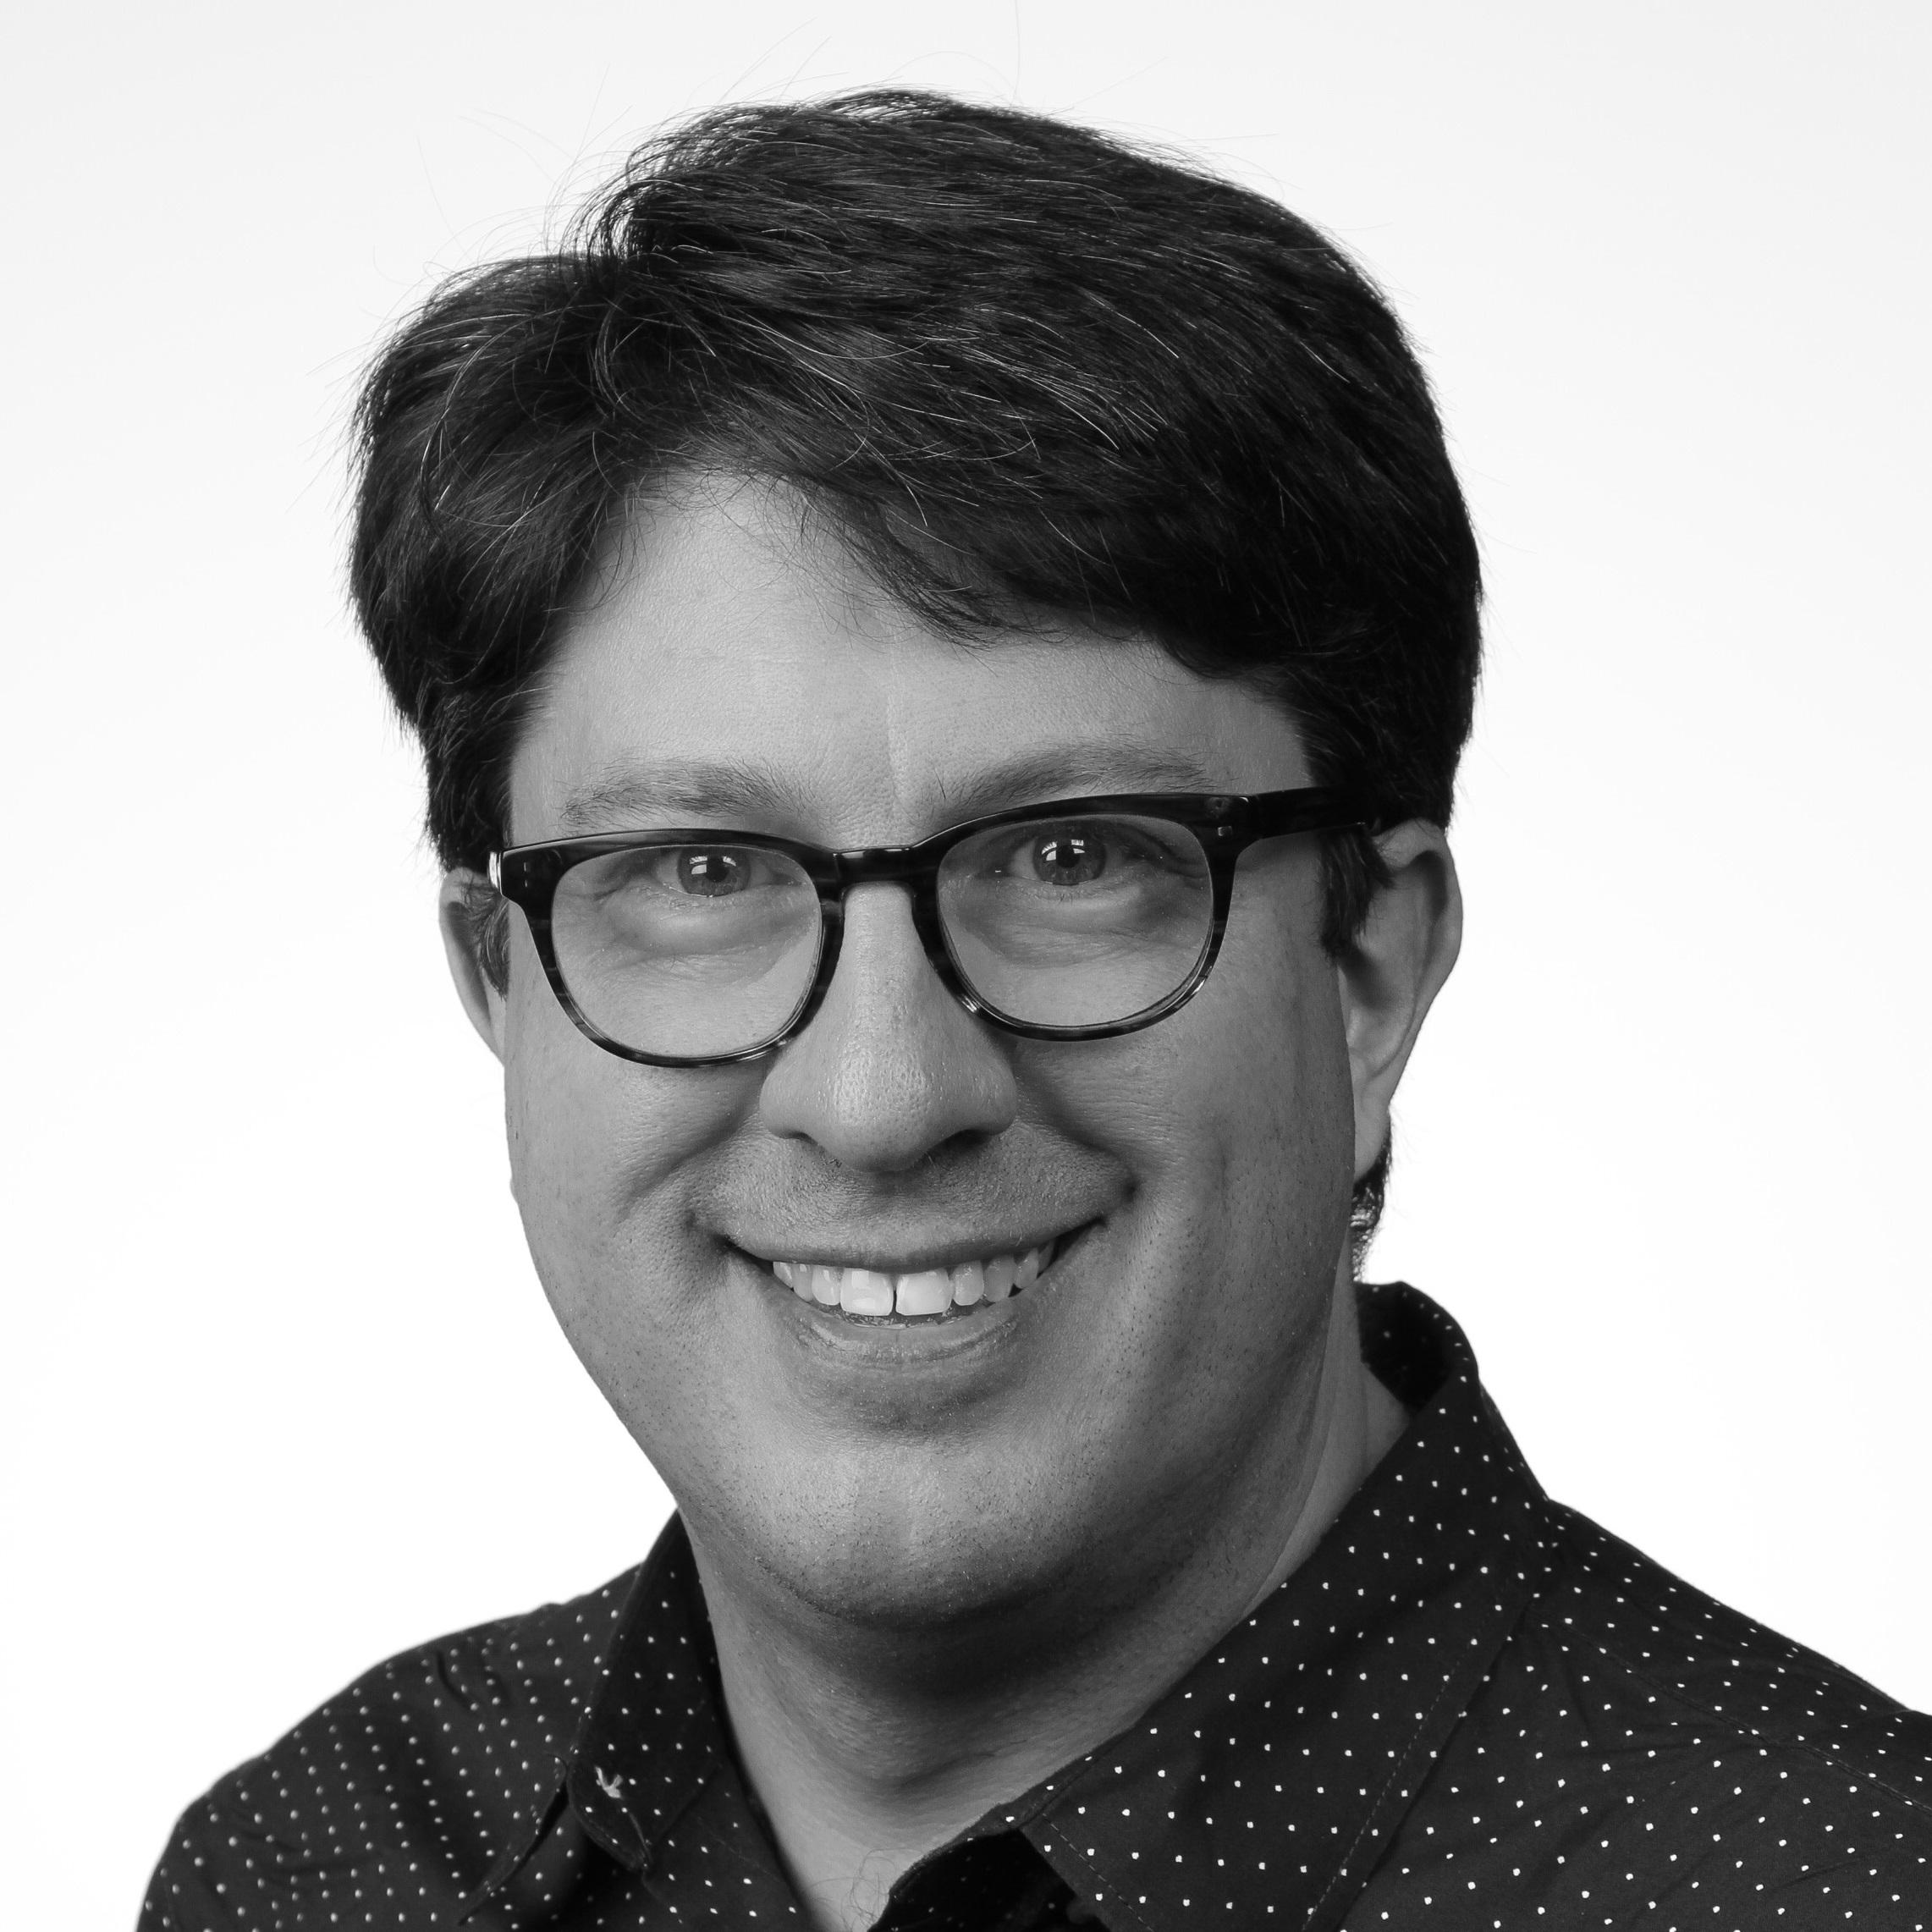 Michael Scherotter